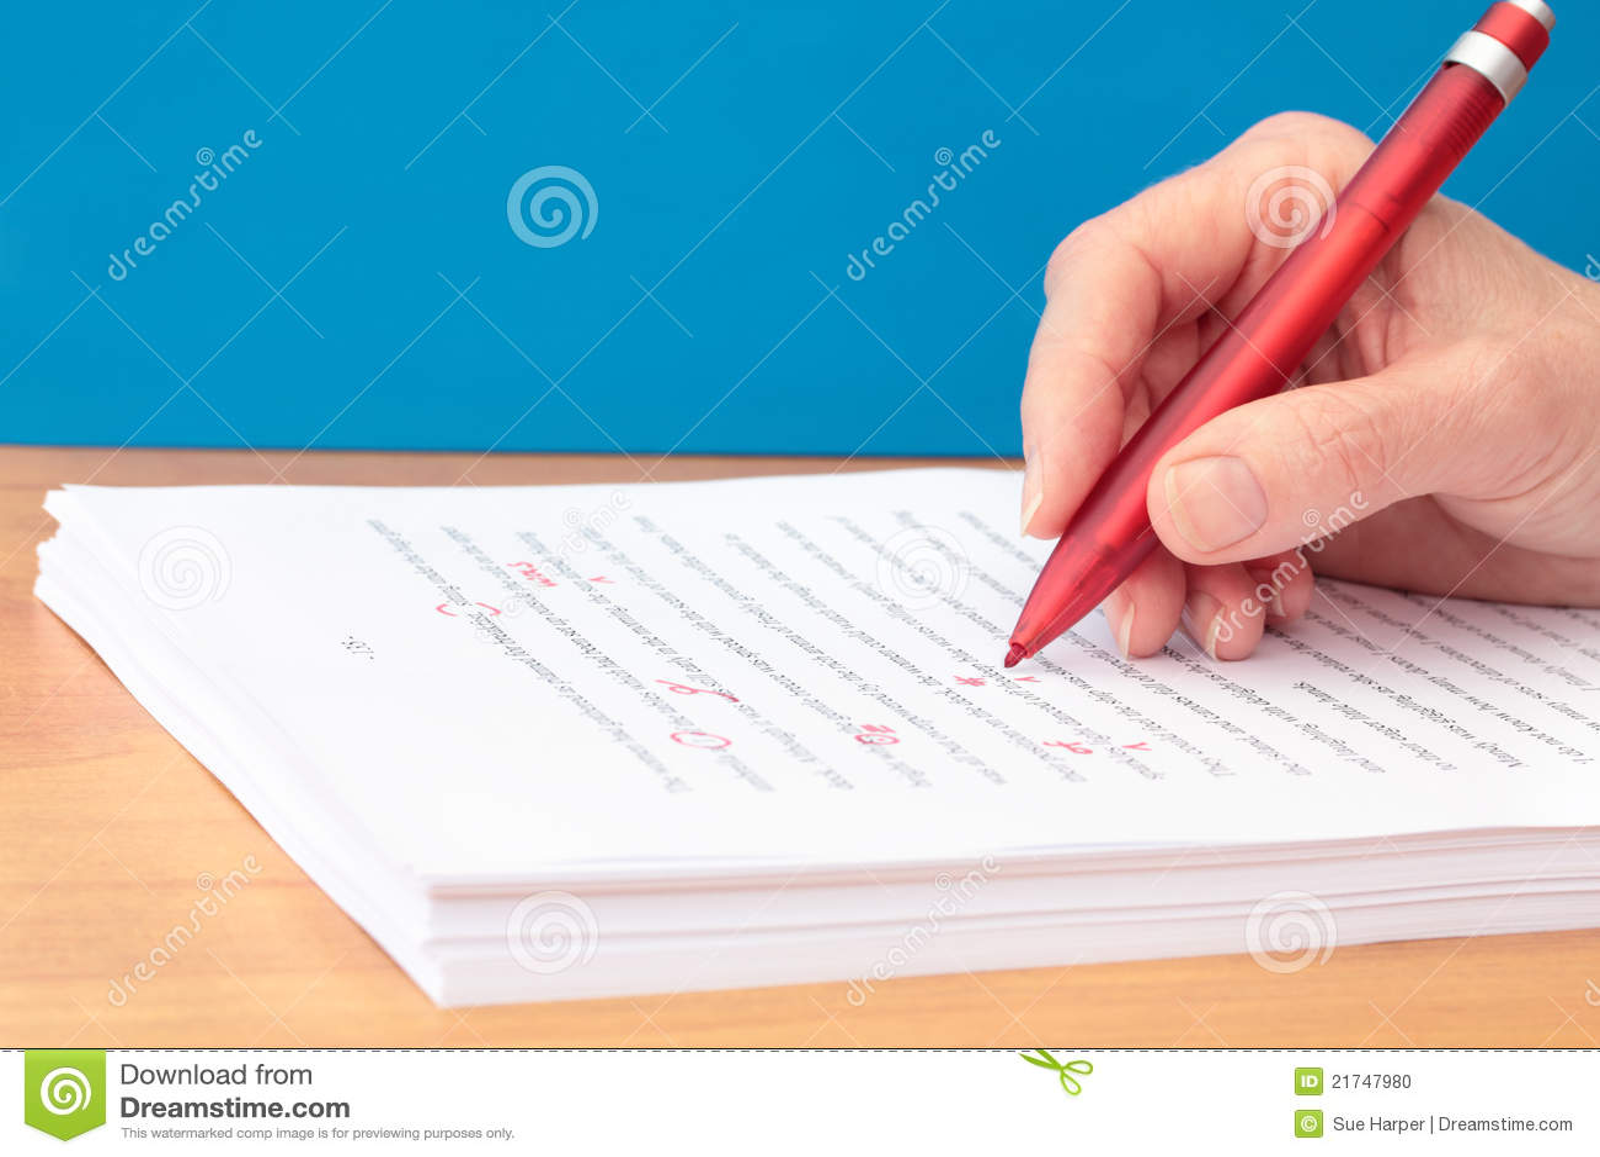 Libro proofreading copy-editing services online